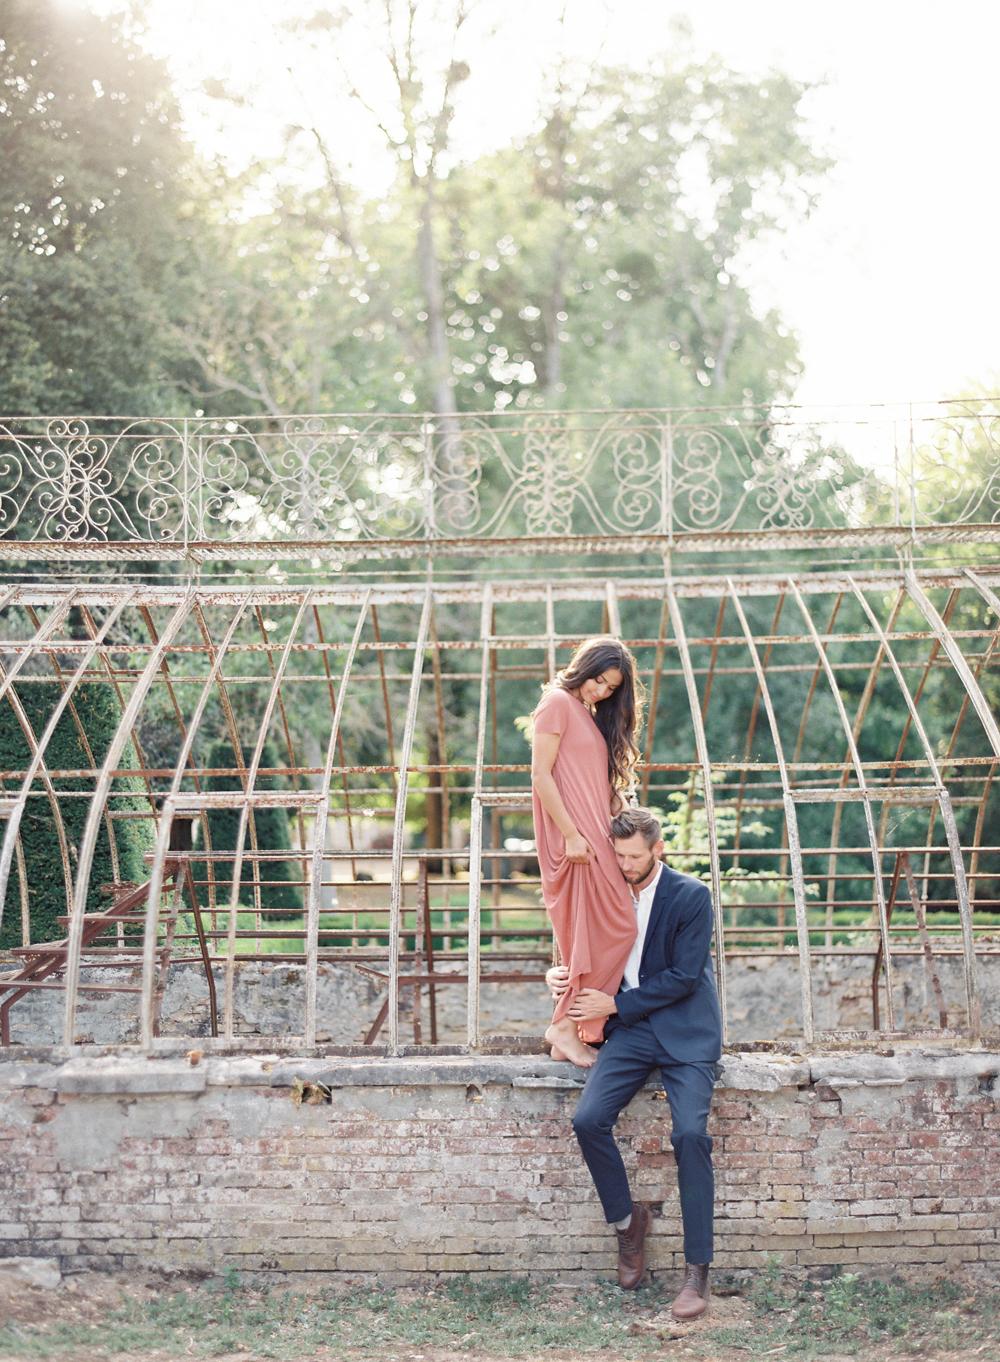 Vicki+Grafton+Photography+Paris+Film+Wedding+Photographer+-15.jpg